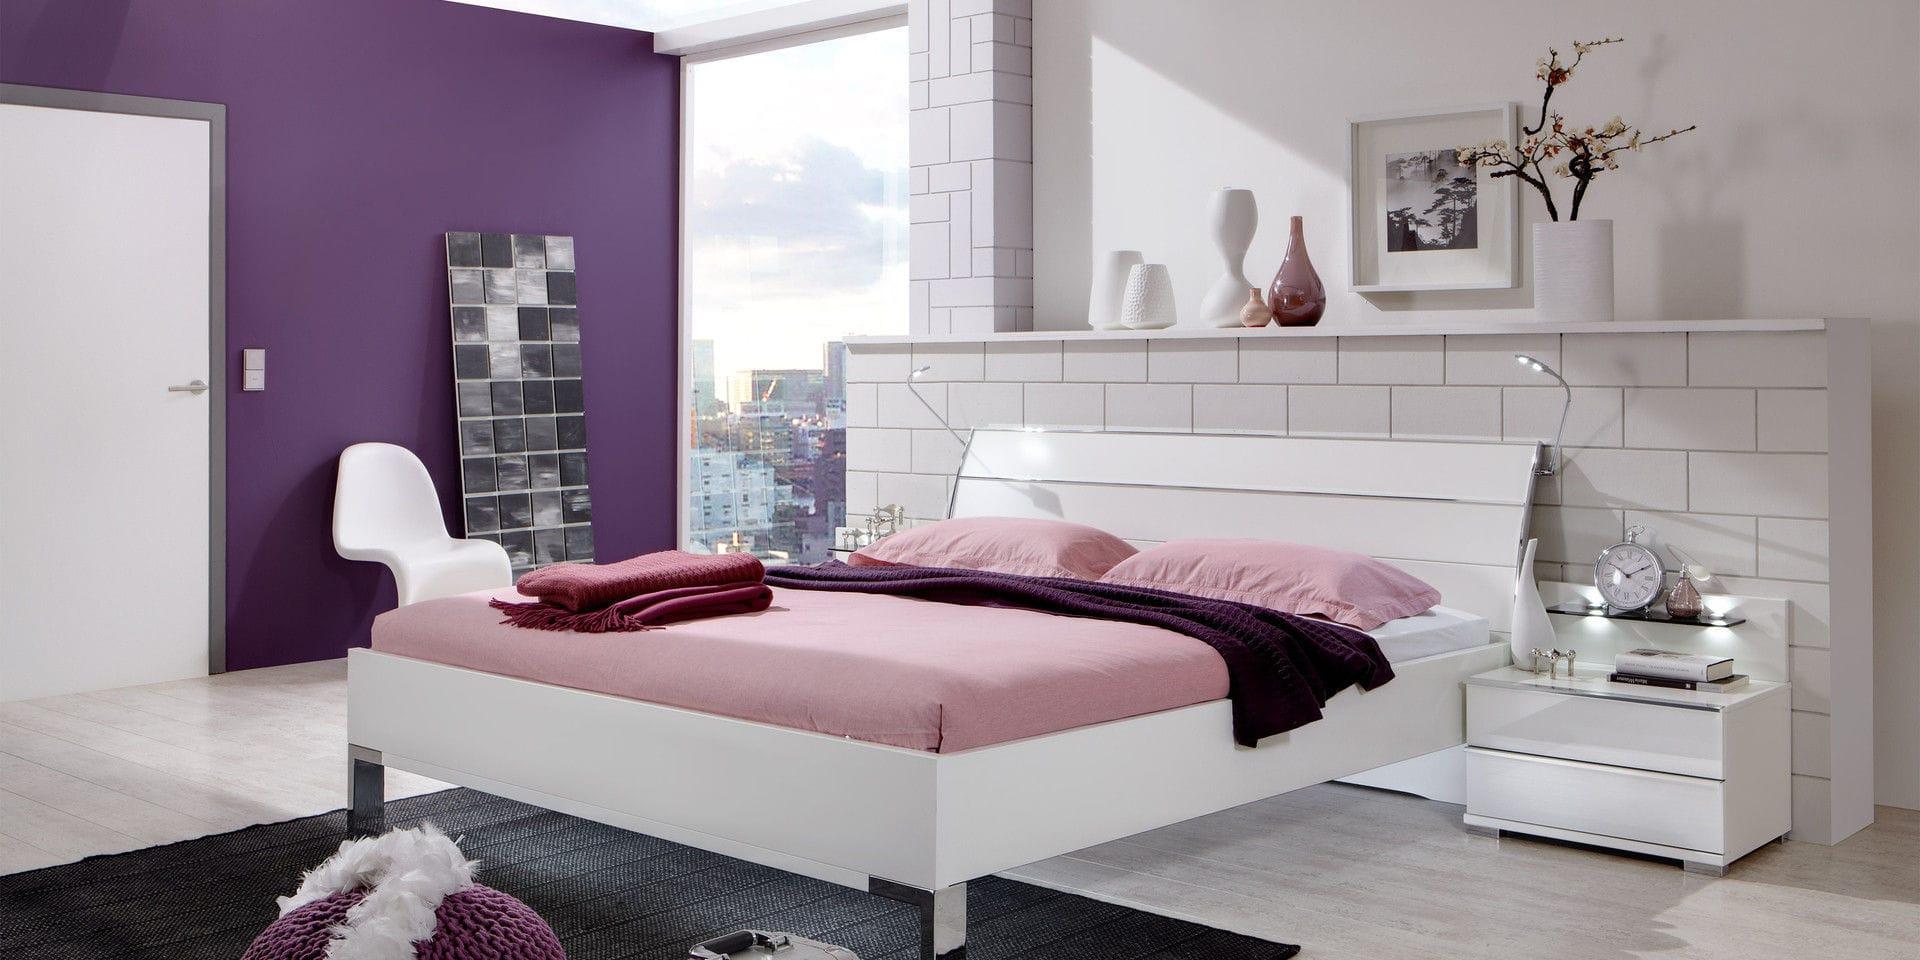 Amazing Double Bed With Lights Wooden Loft Wiemann With Wiemann Loft